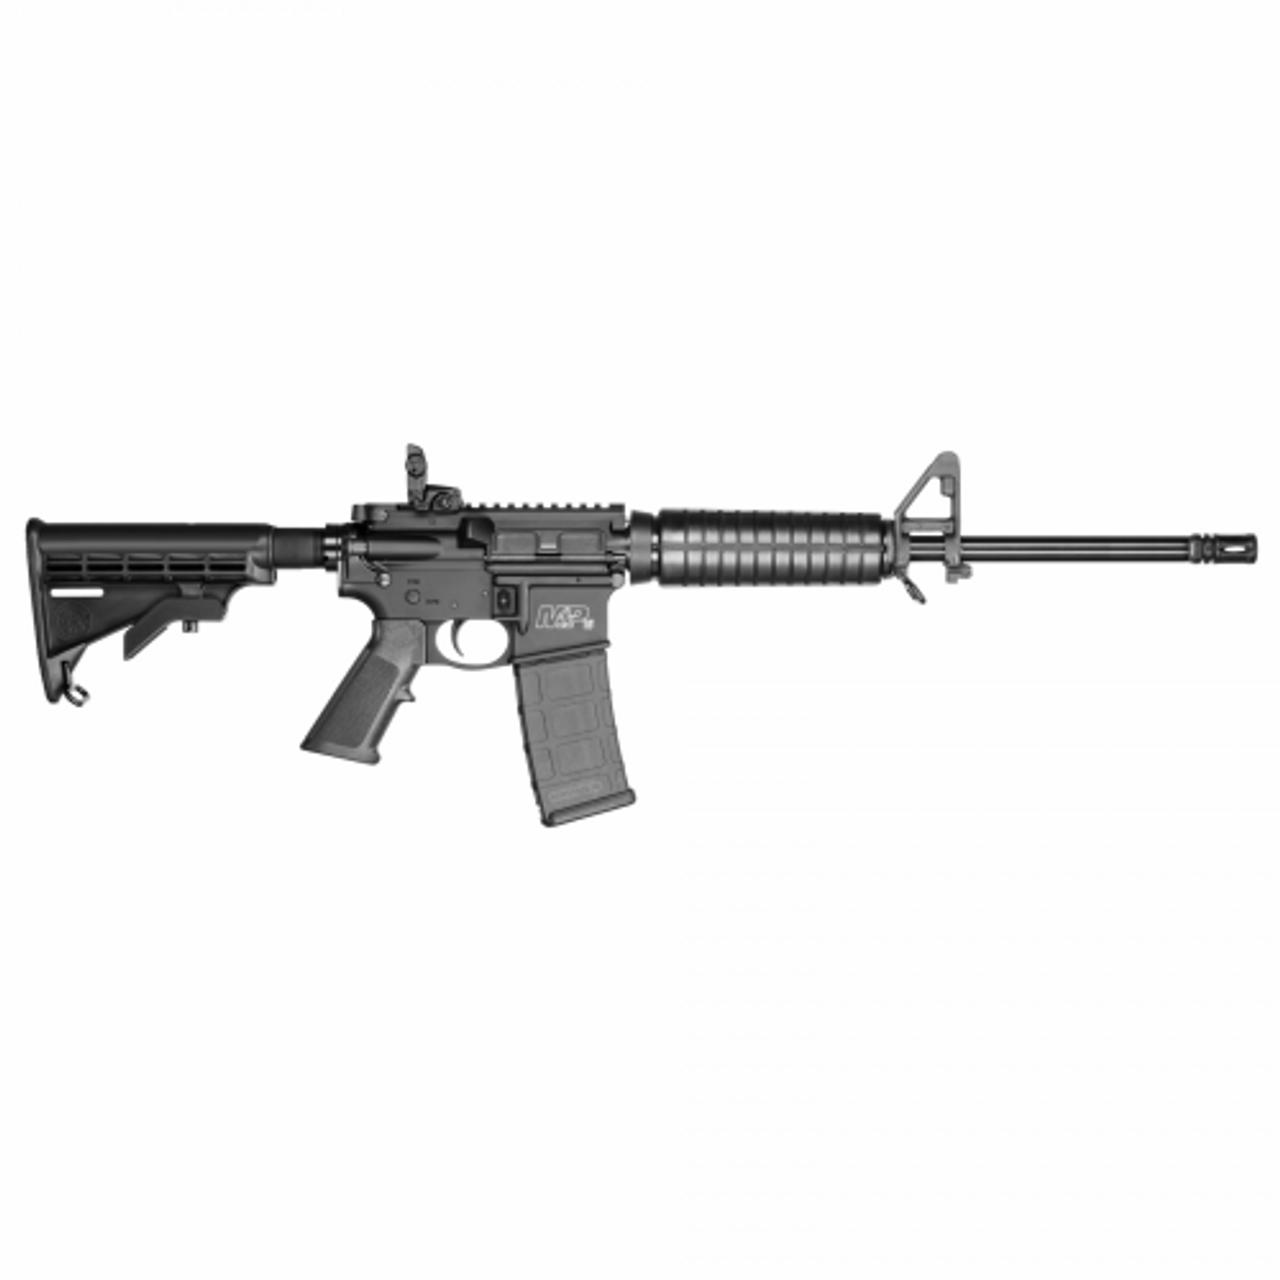 Smith & Wesson M&P 15 Sport II  10202 022188868104